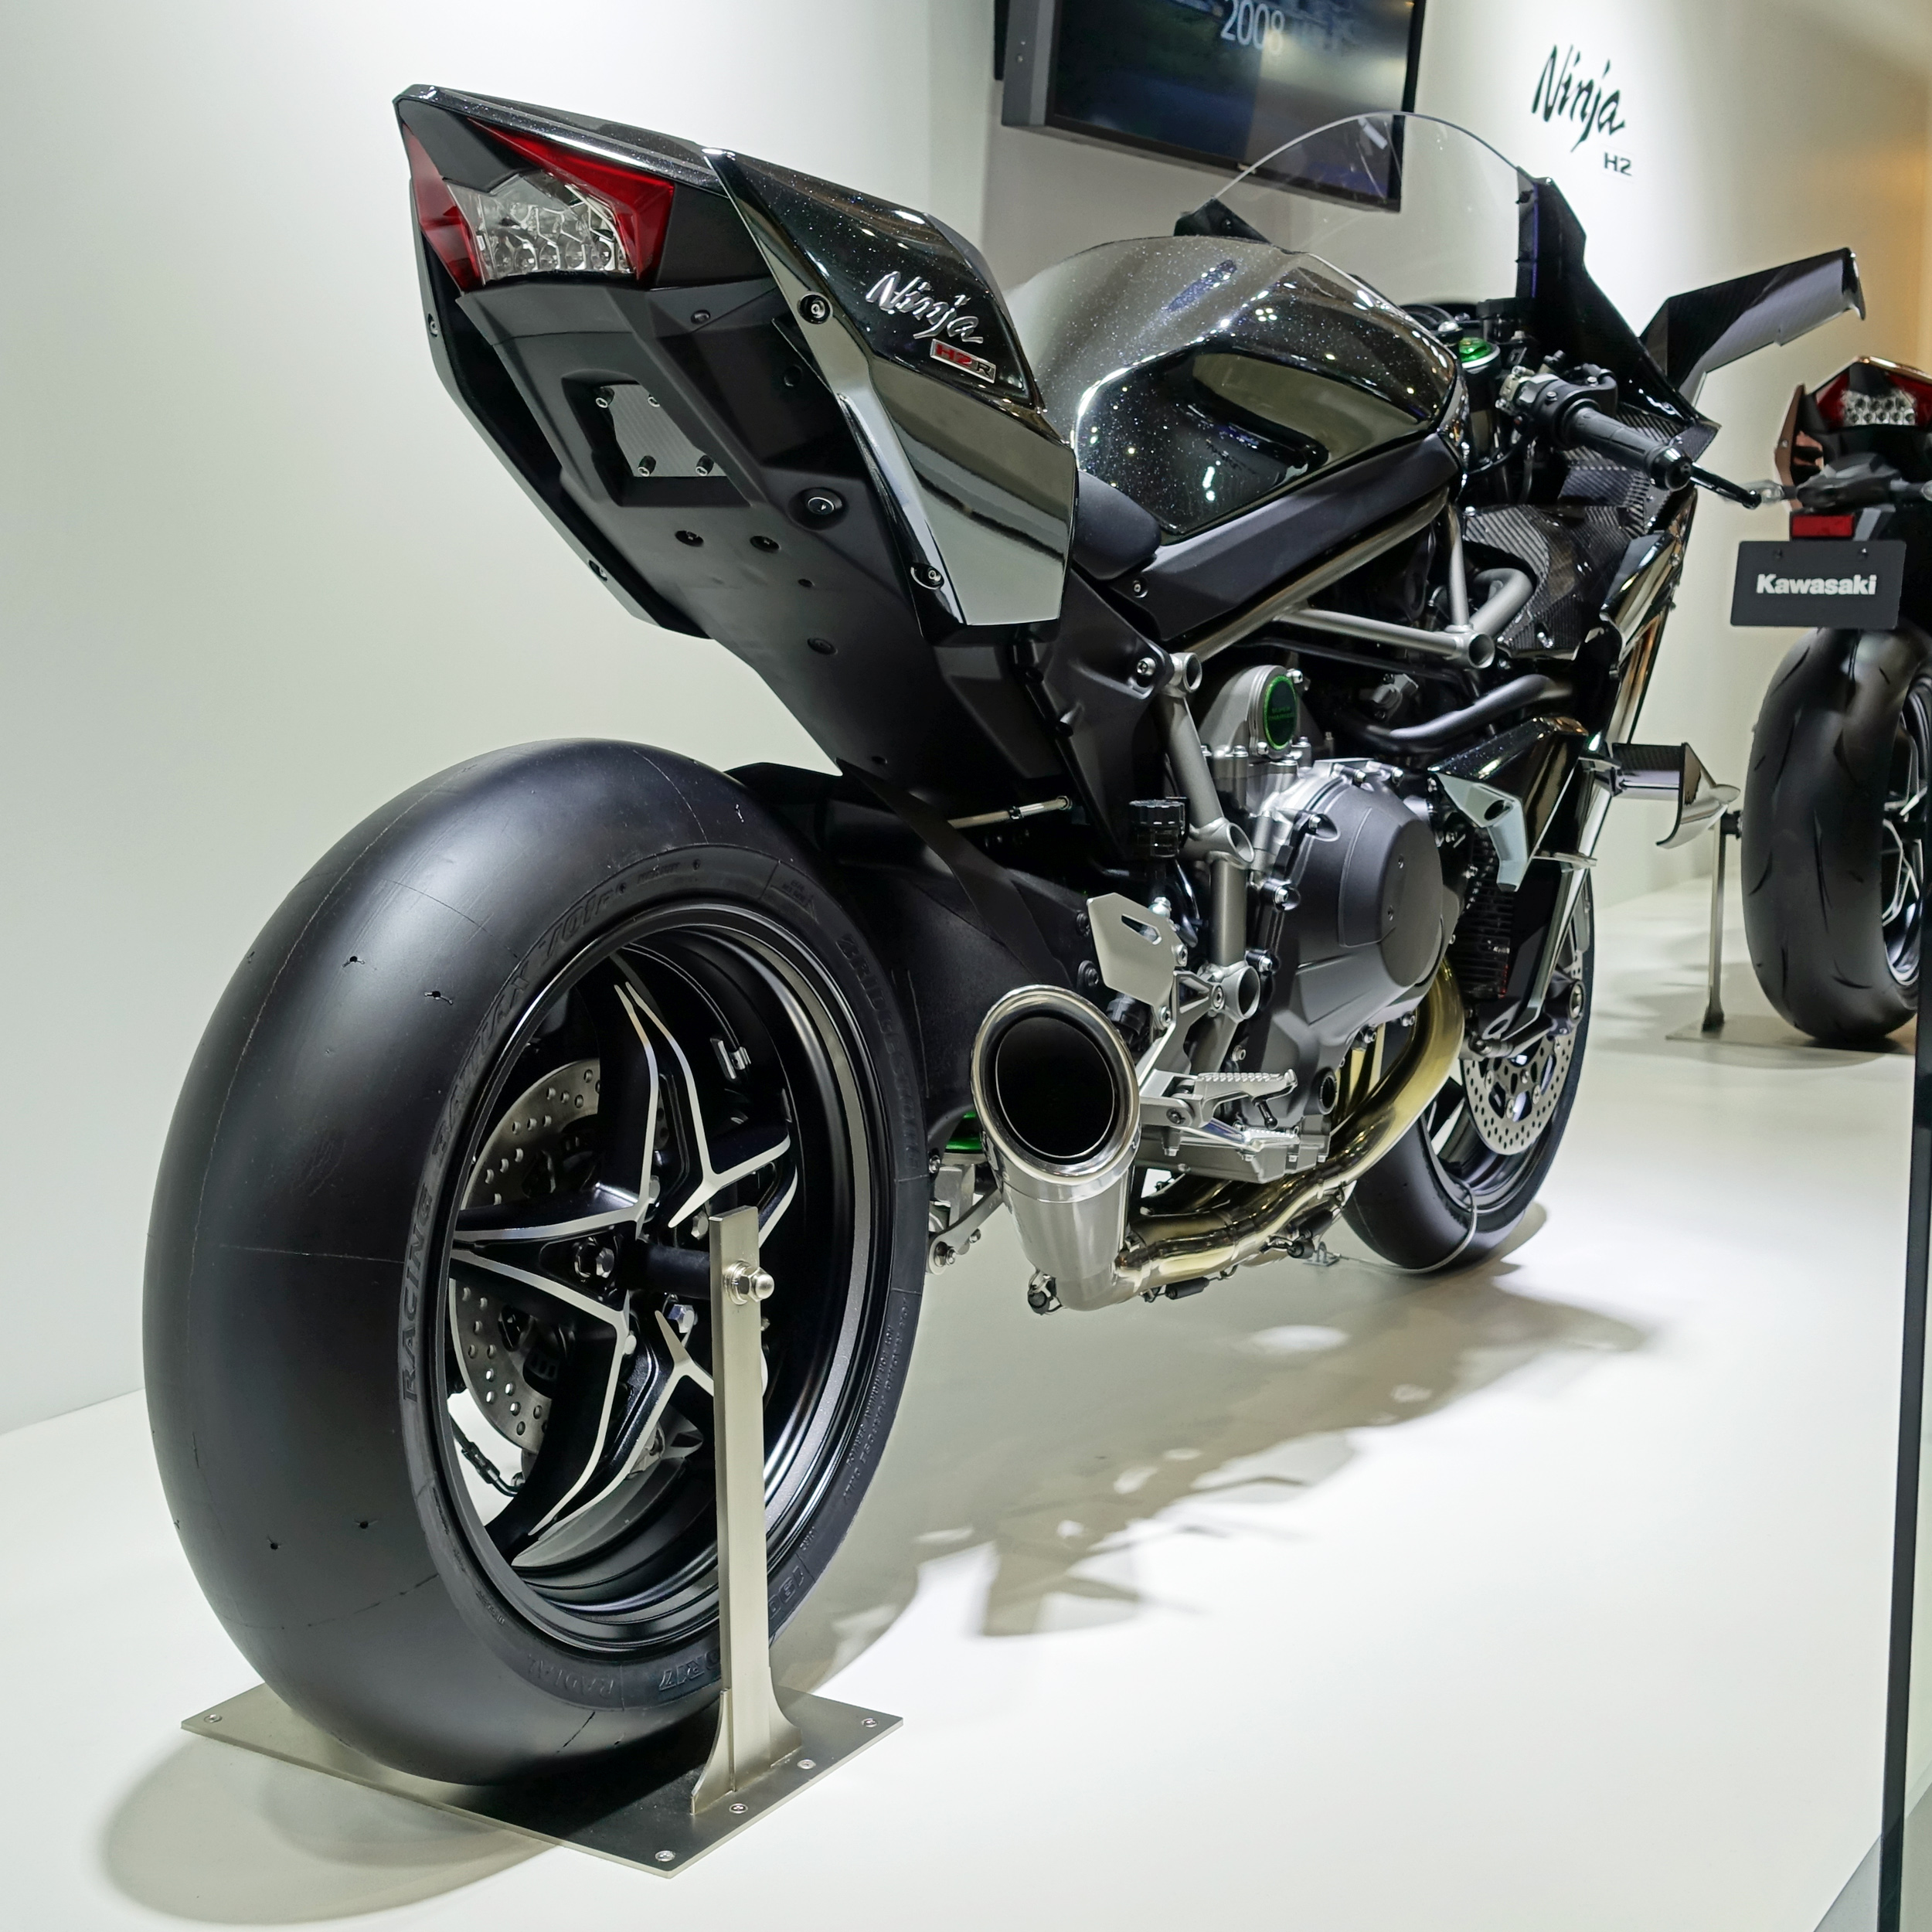 FileKawasaki Ninja H2R At The Tokyo Motor Show 2015 2